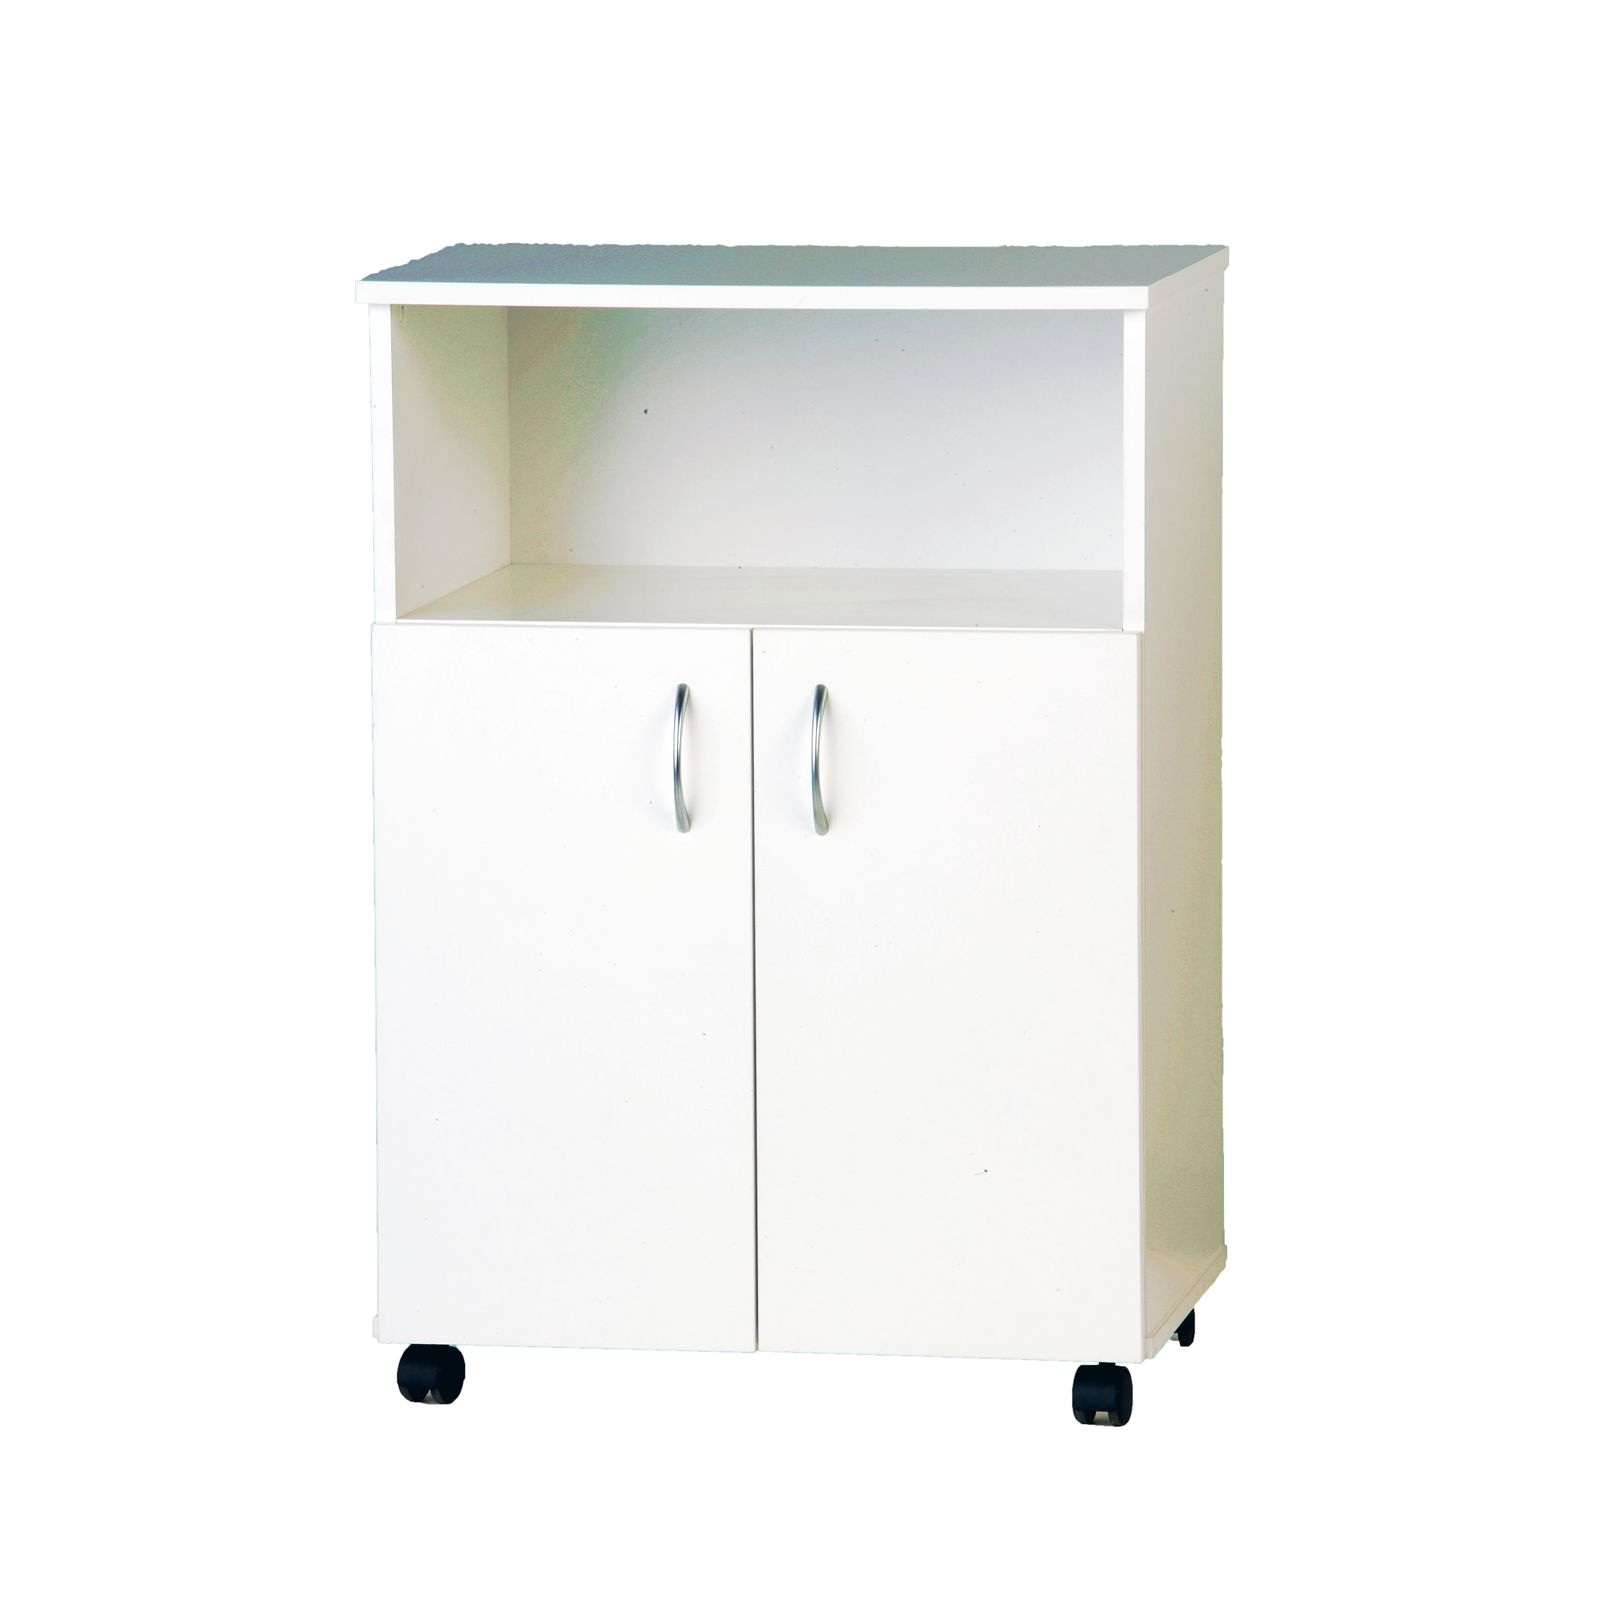 Find Bedford 610mm White 2 Door Microwave Trolley At Bunnings